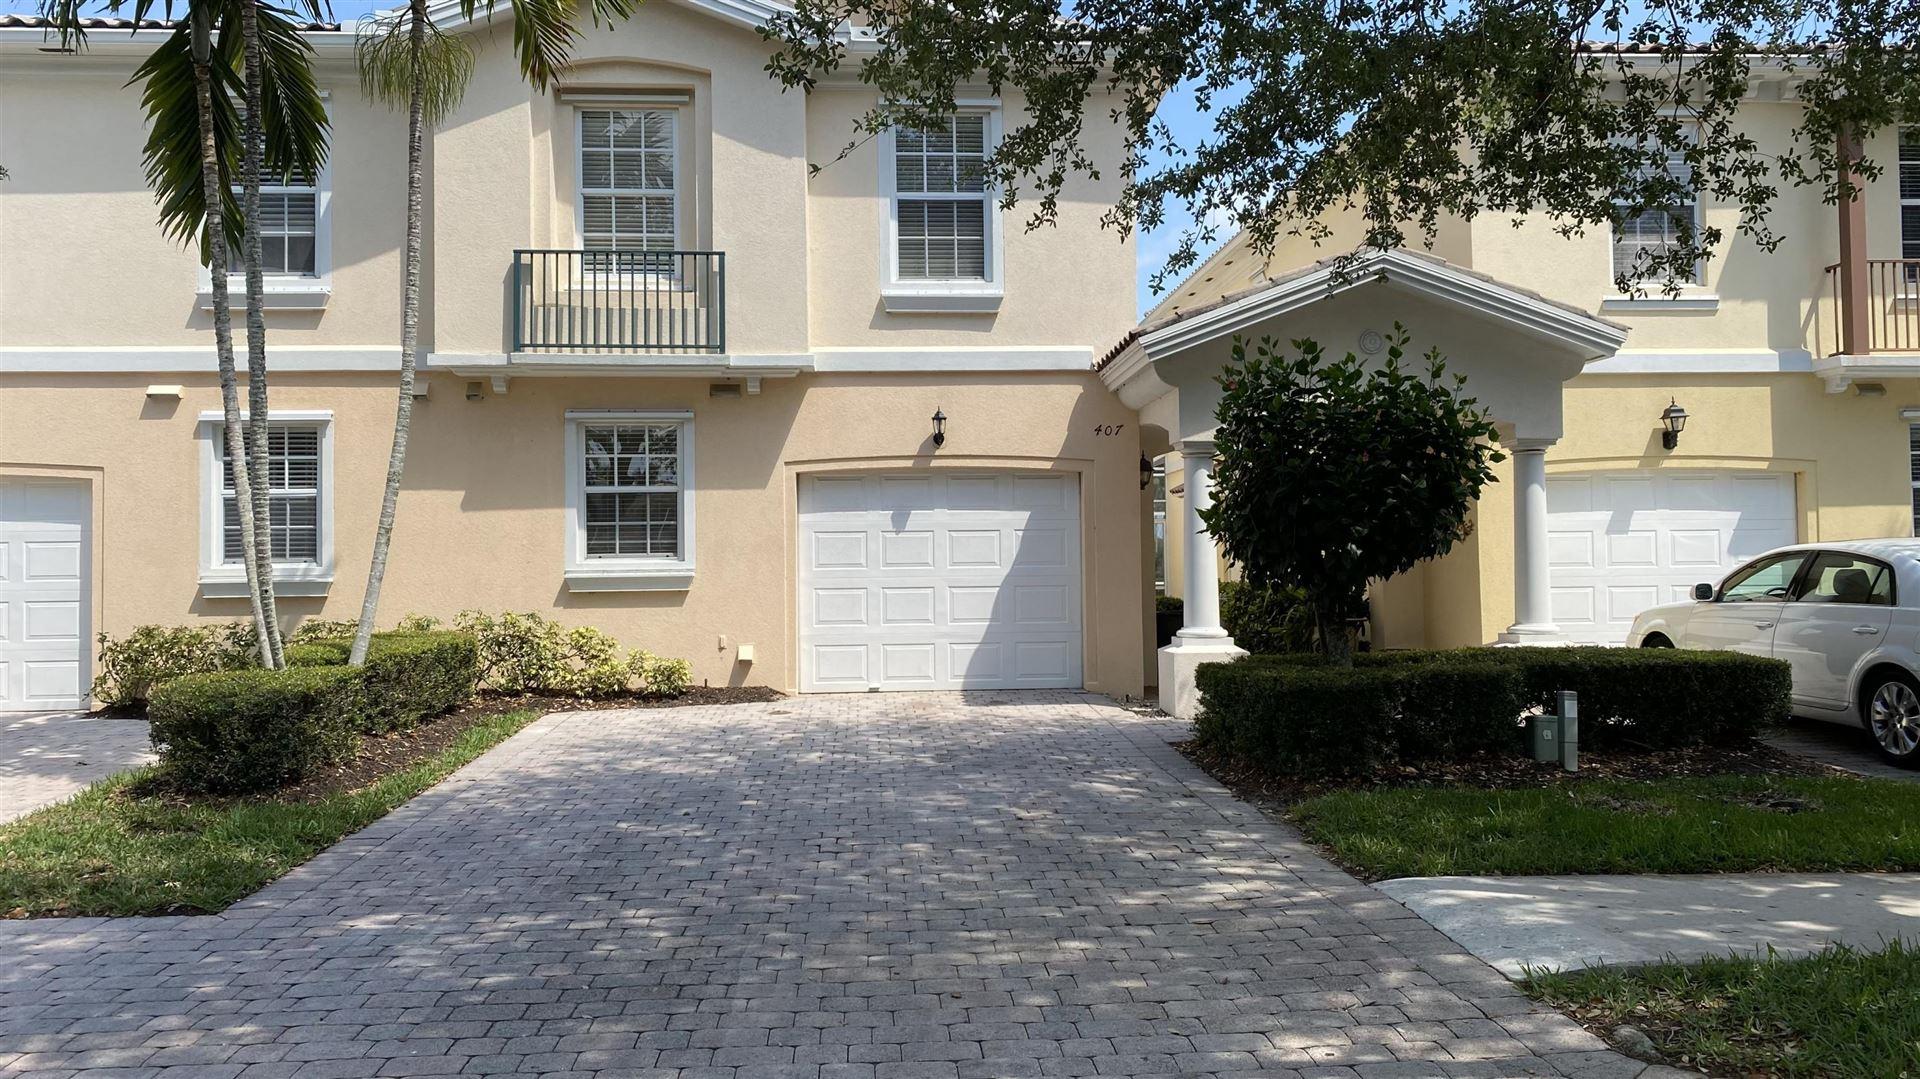 Photo of 407 Capistrano Drive, Palm Beach Gardens, FL 33410 (MLS # RX-10709530)